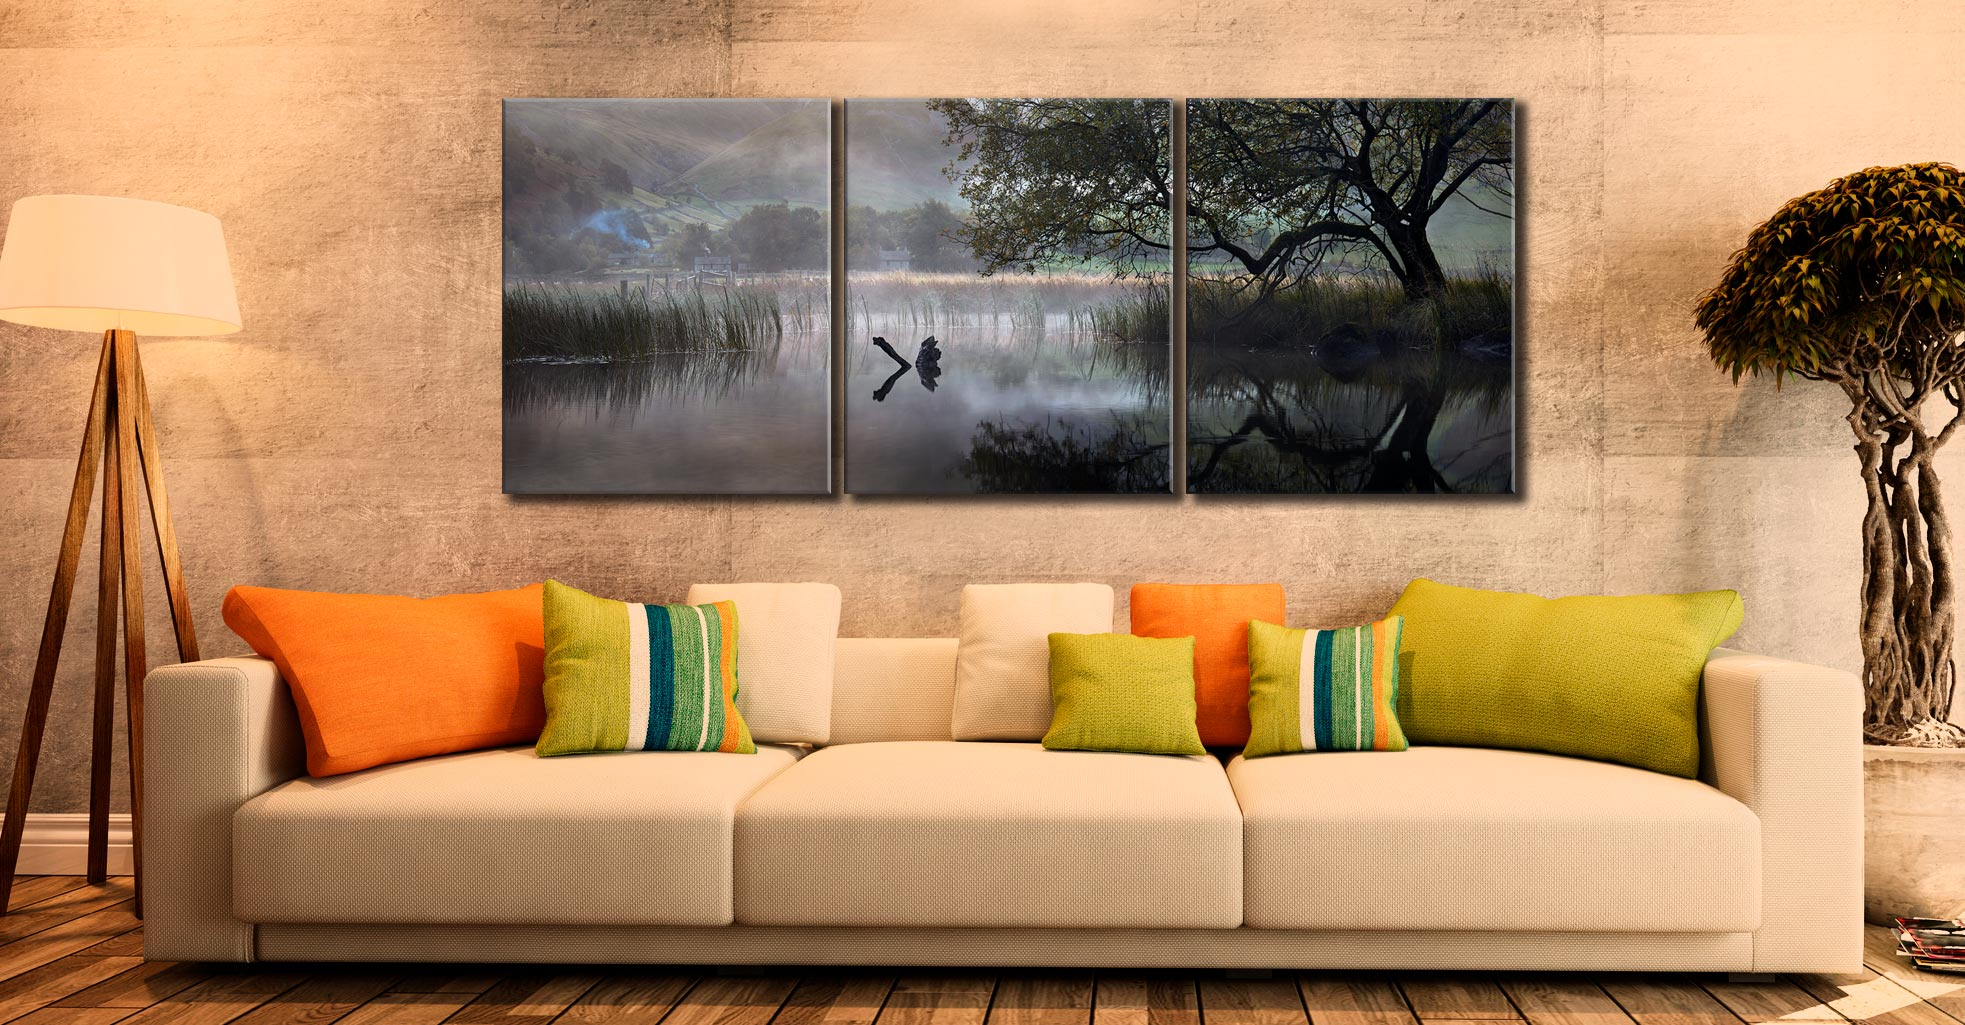 Hartsop Misty Morning - 3 Panel Canvas on Wall